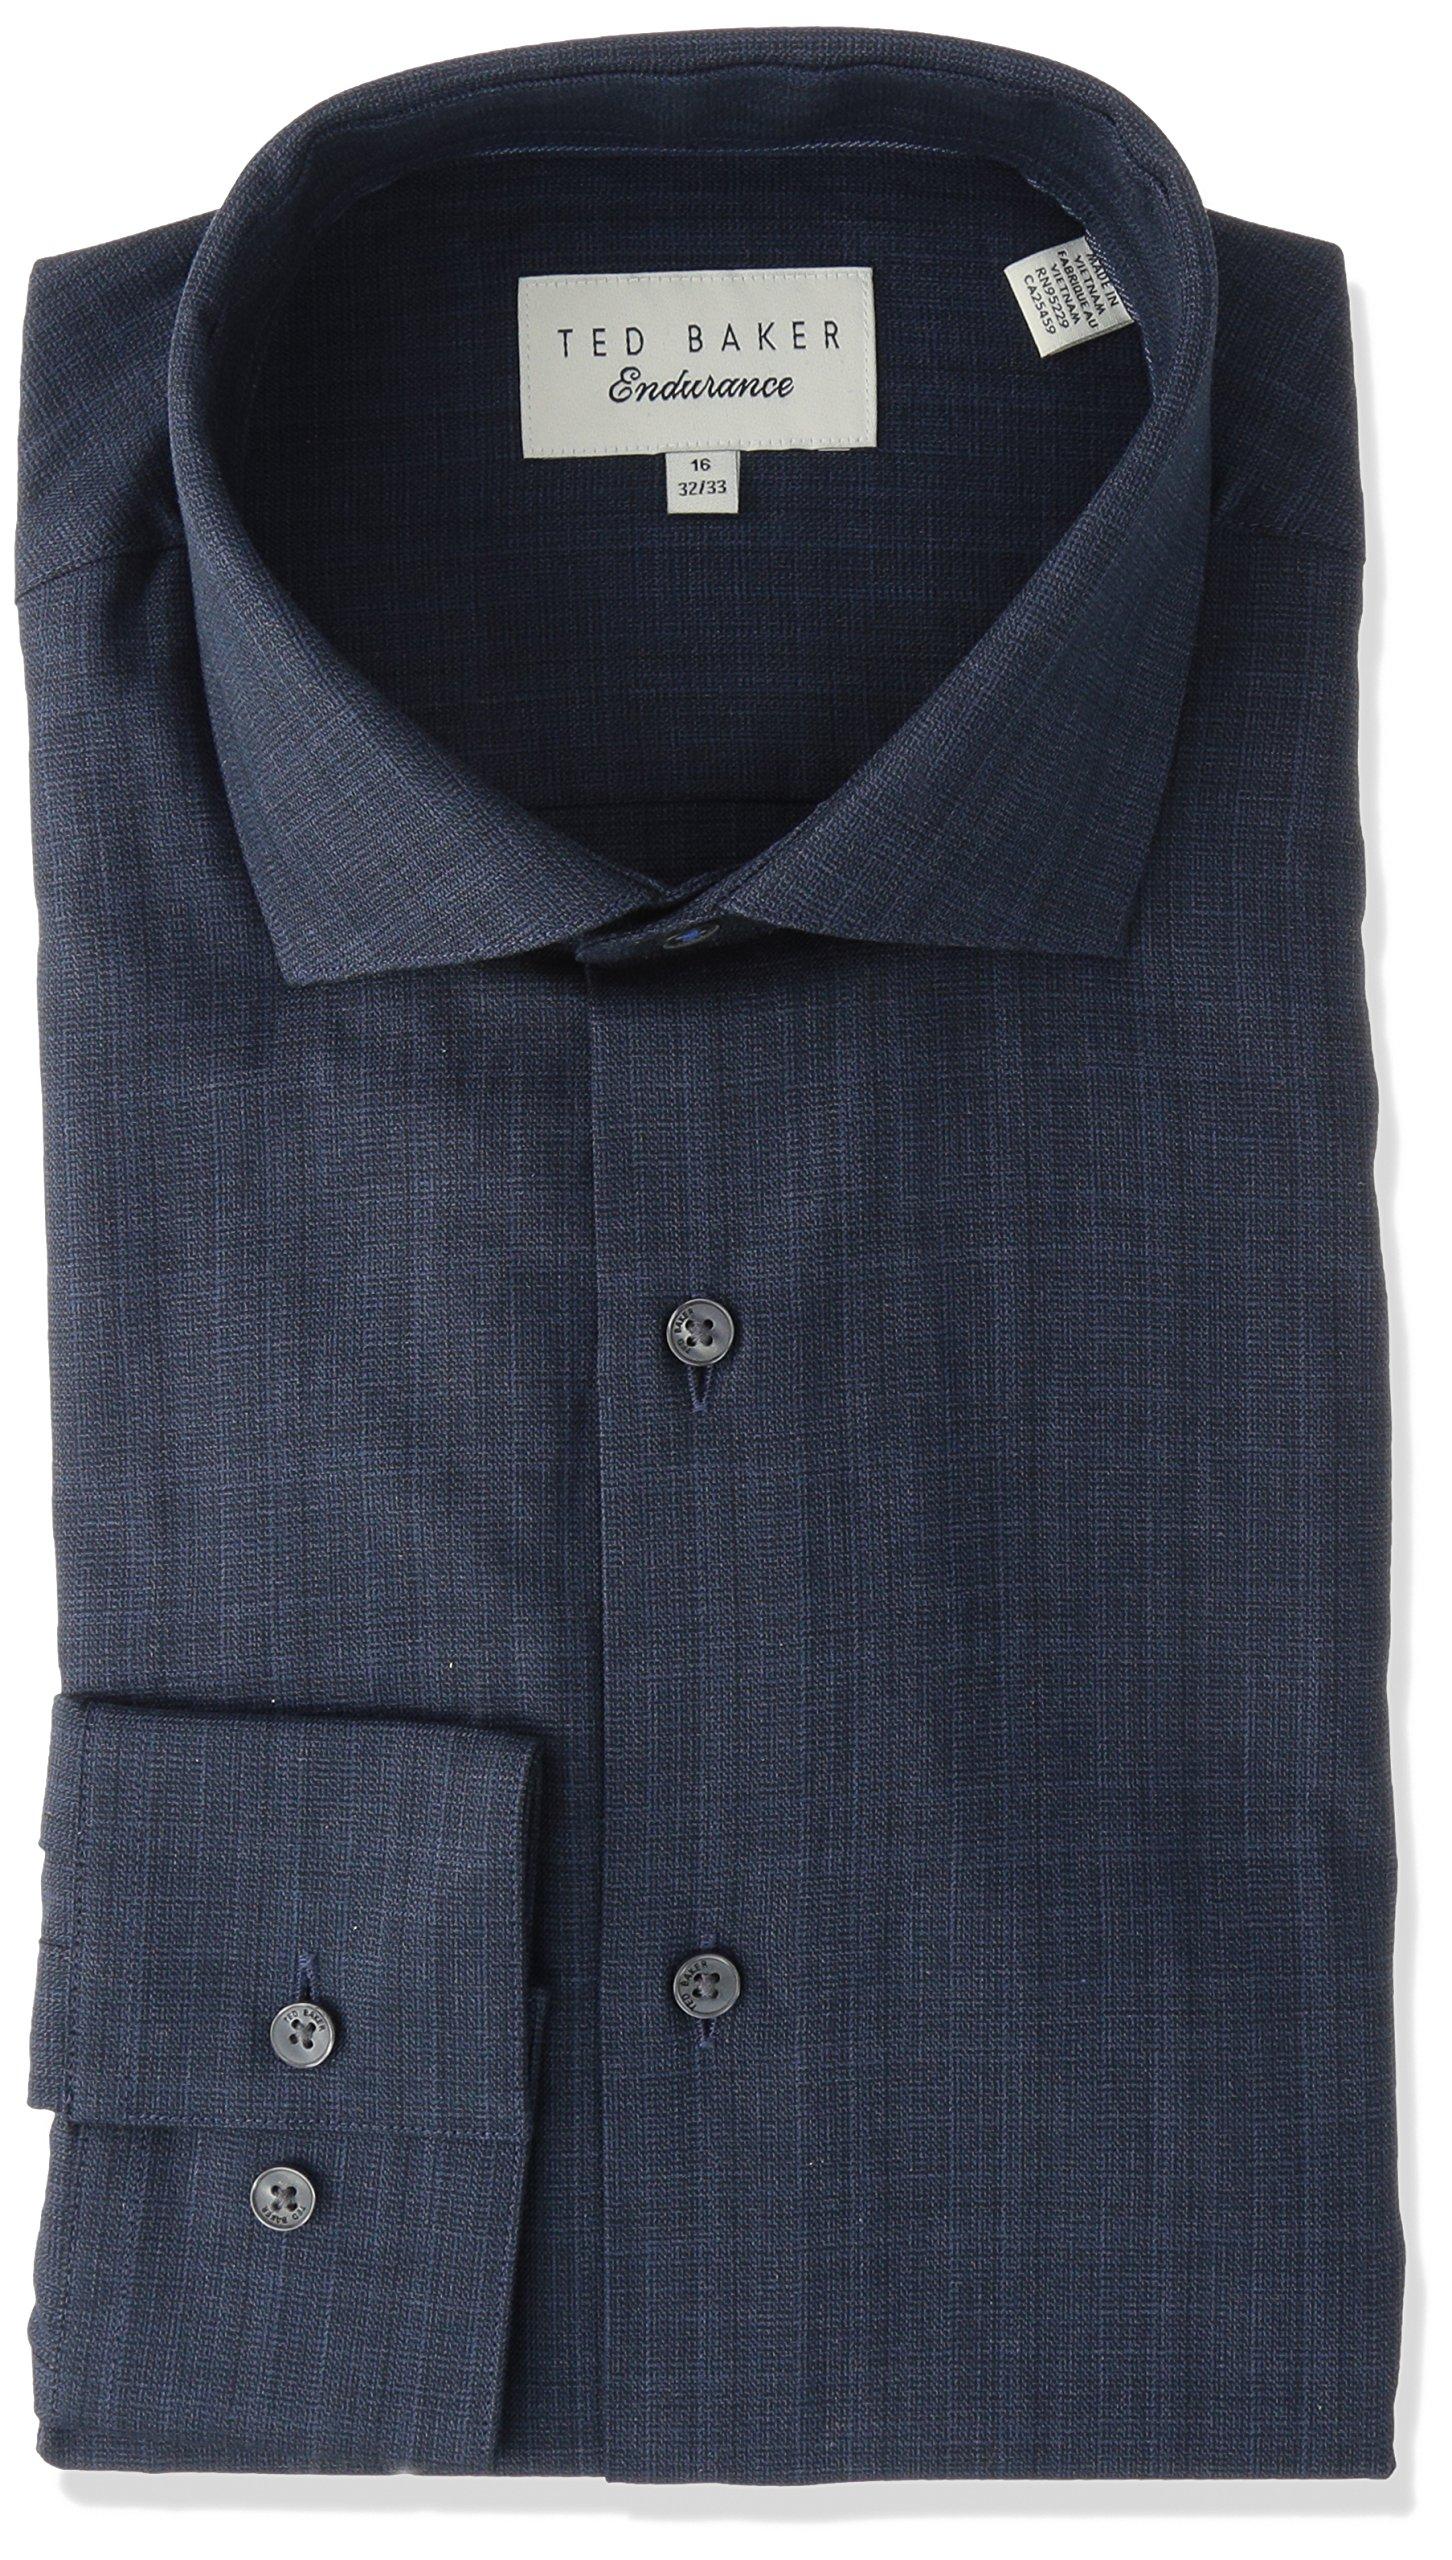 Ted Baker Men's Cholet Slim Fit Dress Shirt, Navy, 15.5'' Neck 32-33'' Sleeve